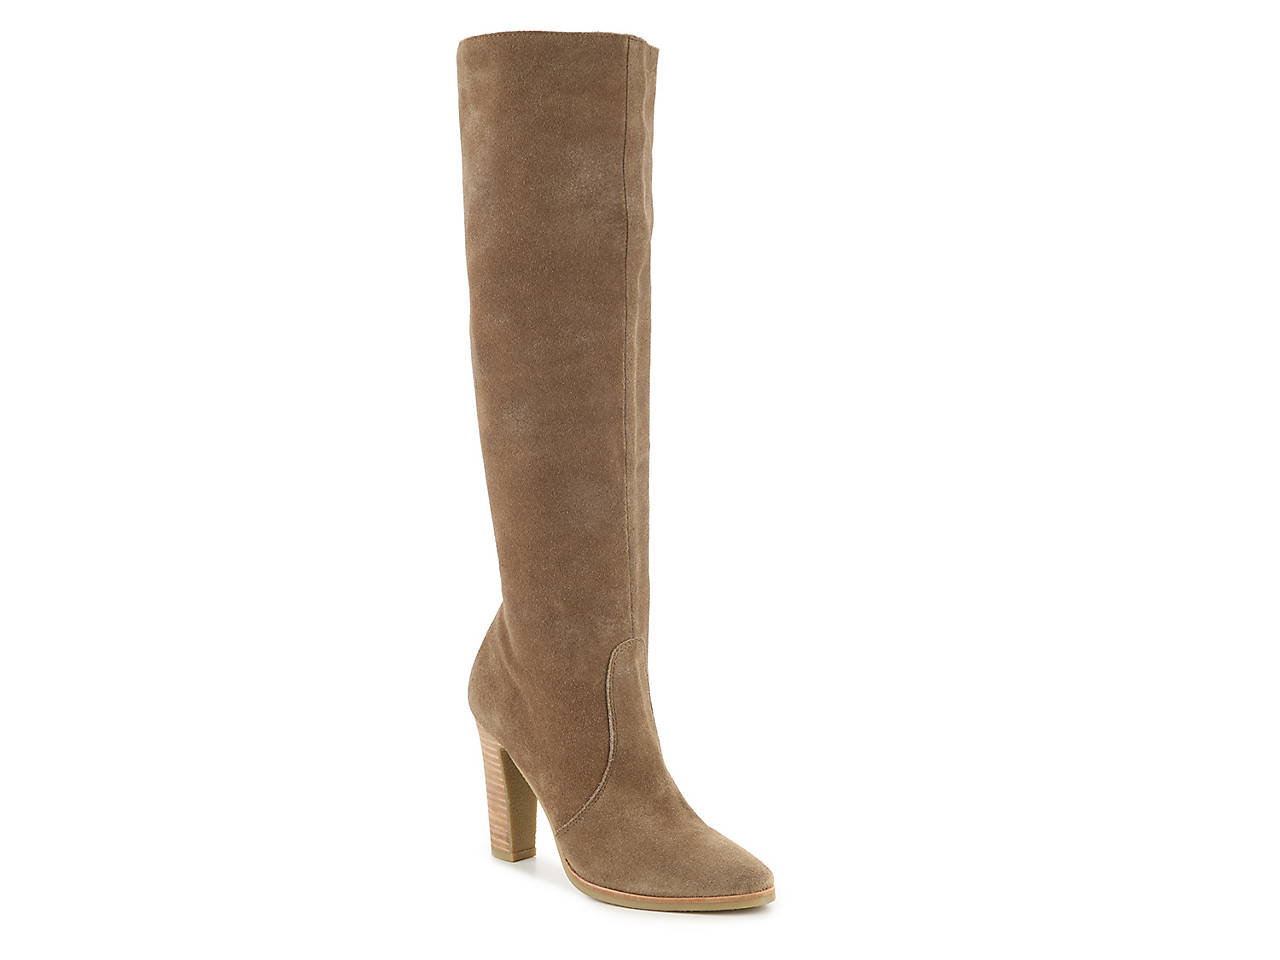 Céline Suede Knee-High Boots